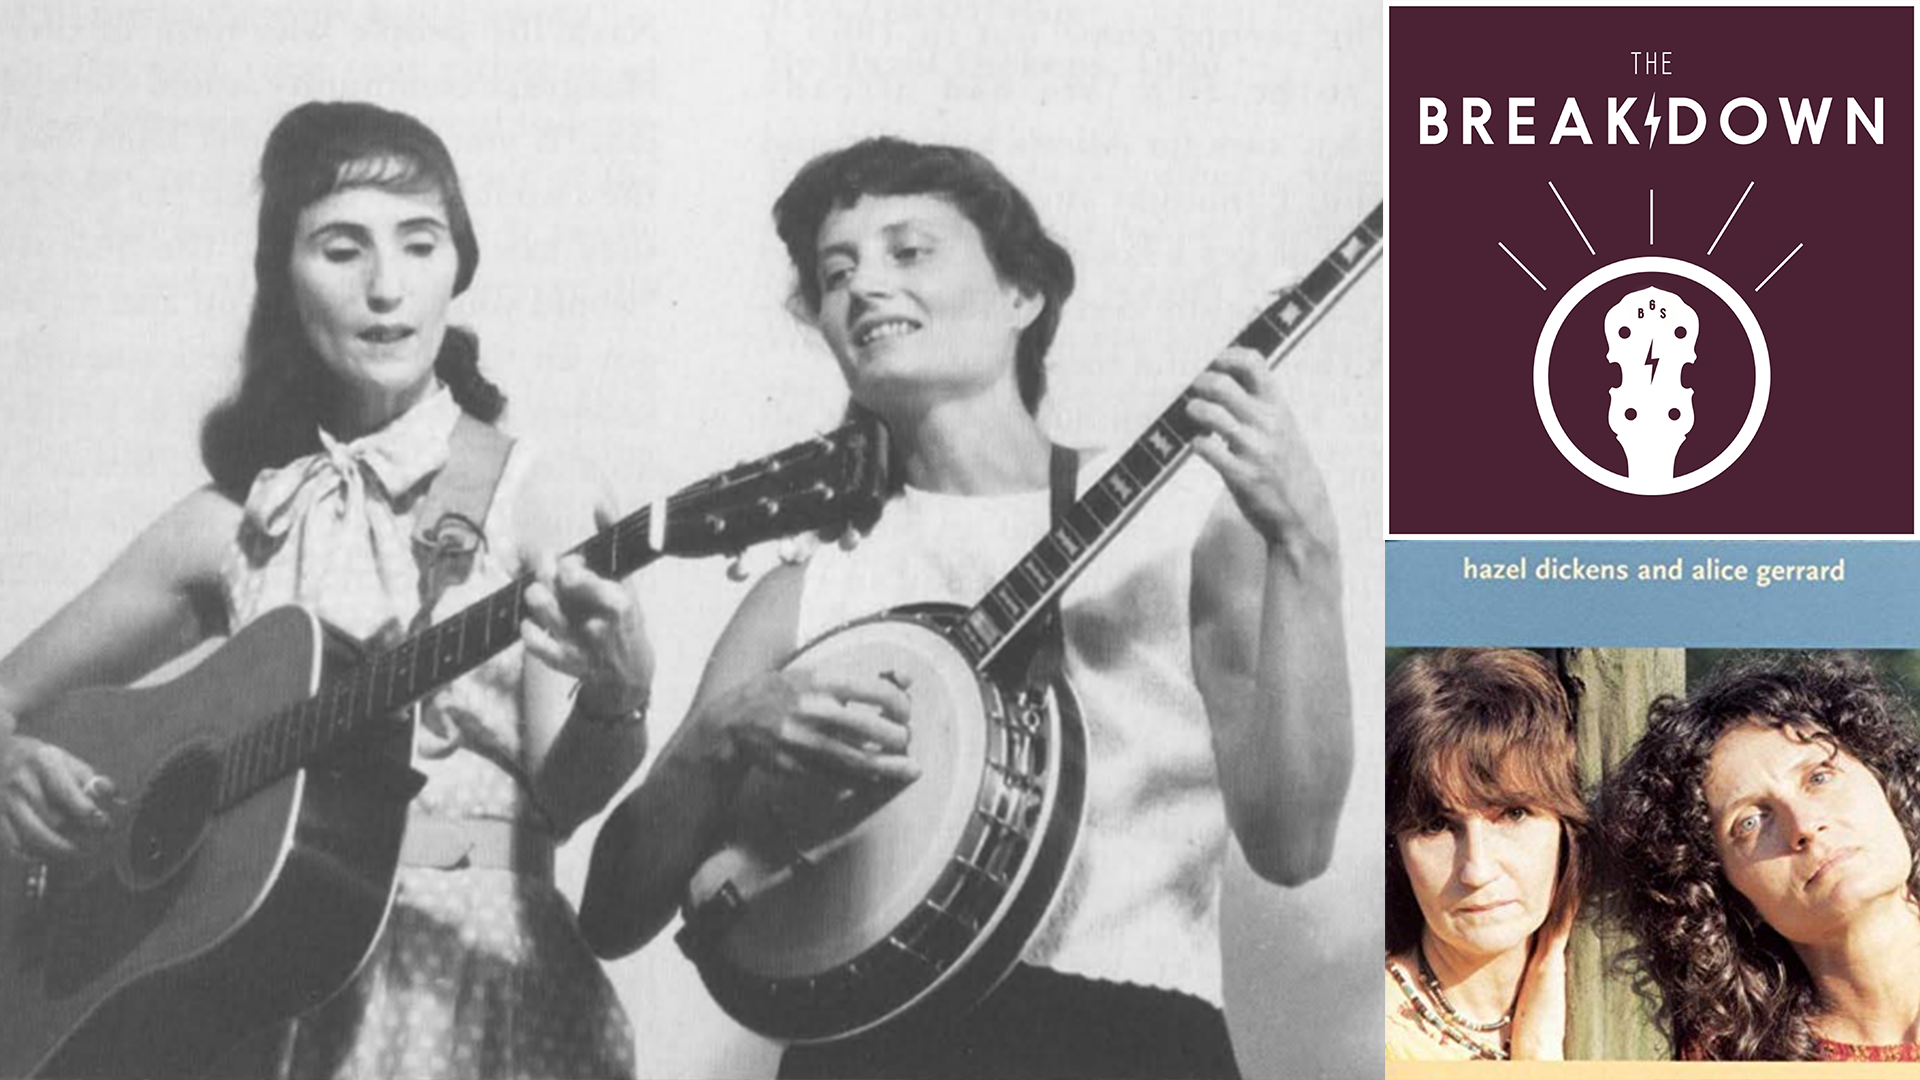 The Breakdown - Hazel Dickens and Alice Gerrard